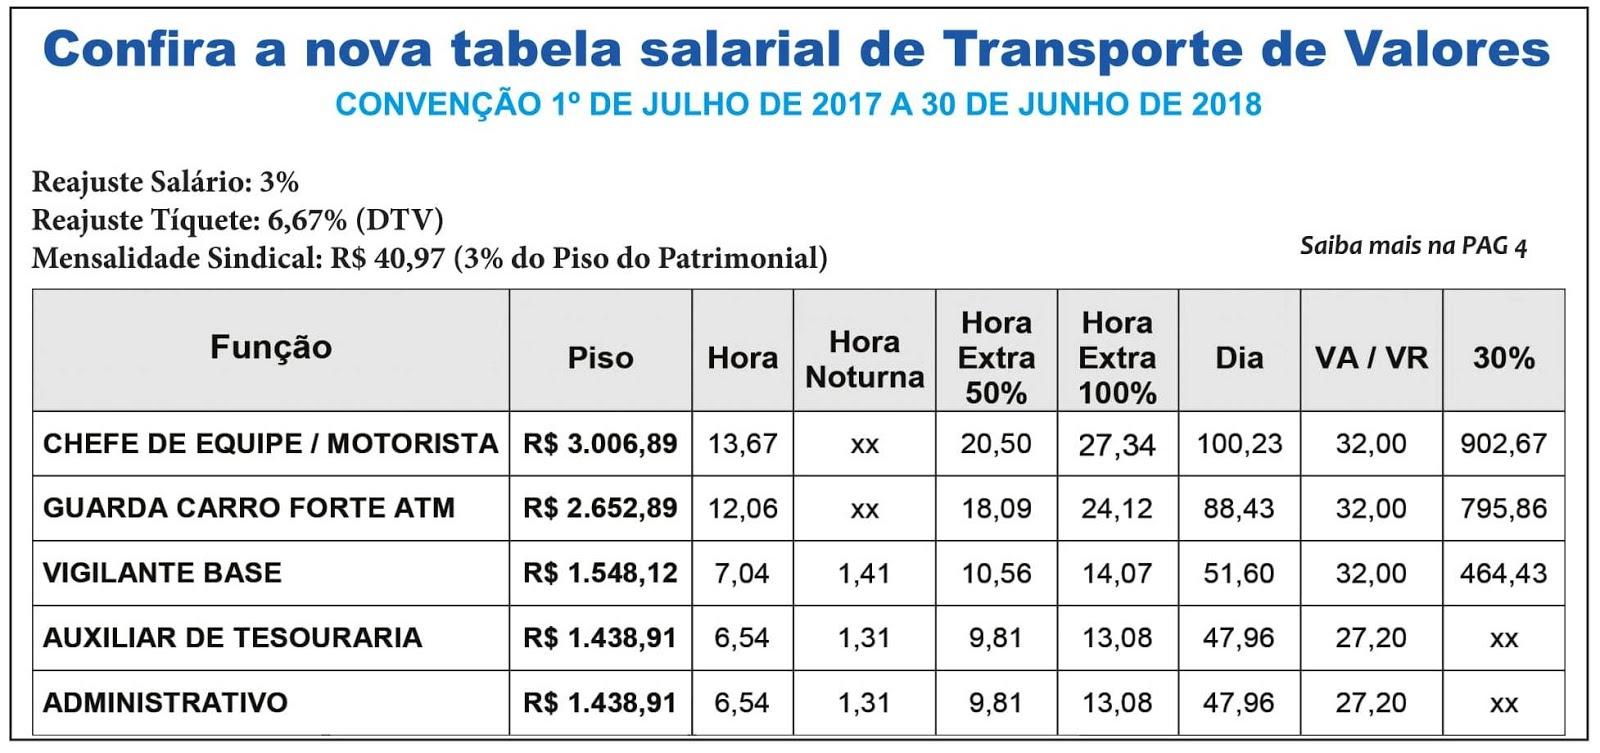 Tabela Salarial de Transporte de Valores